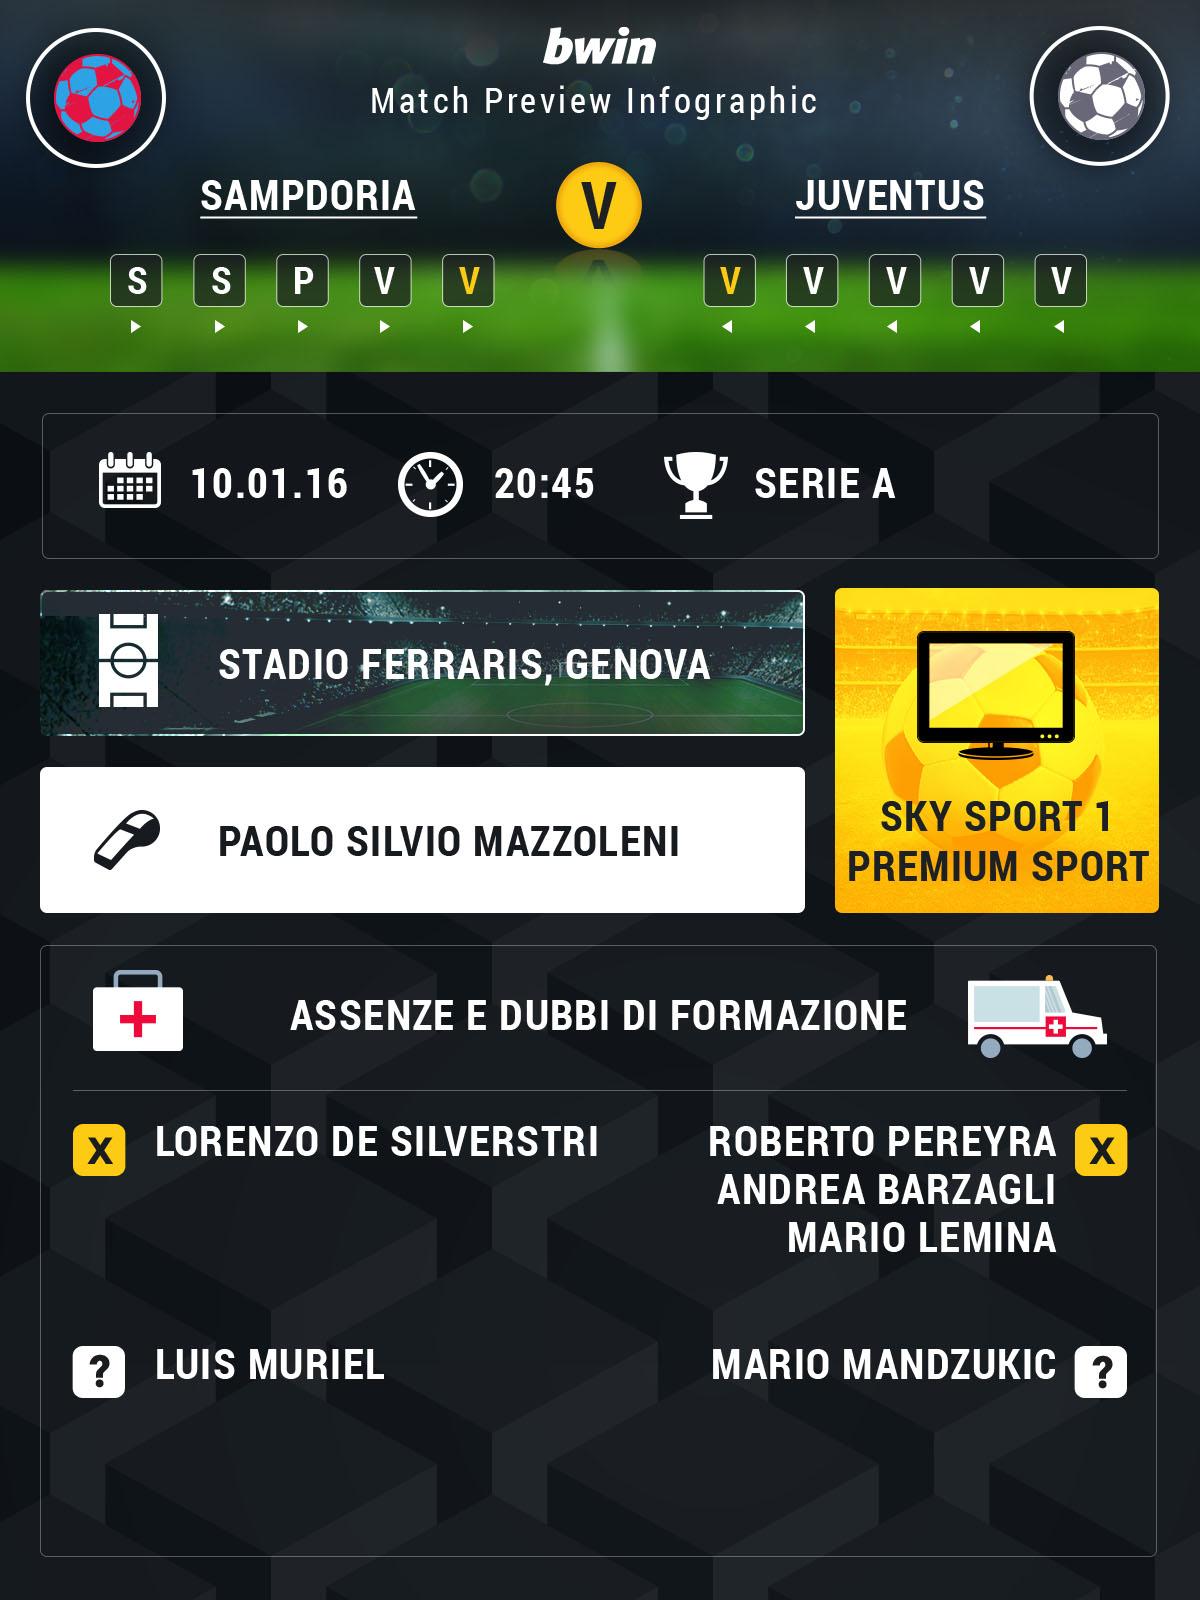 Sampdoria-Juventus preview